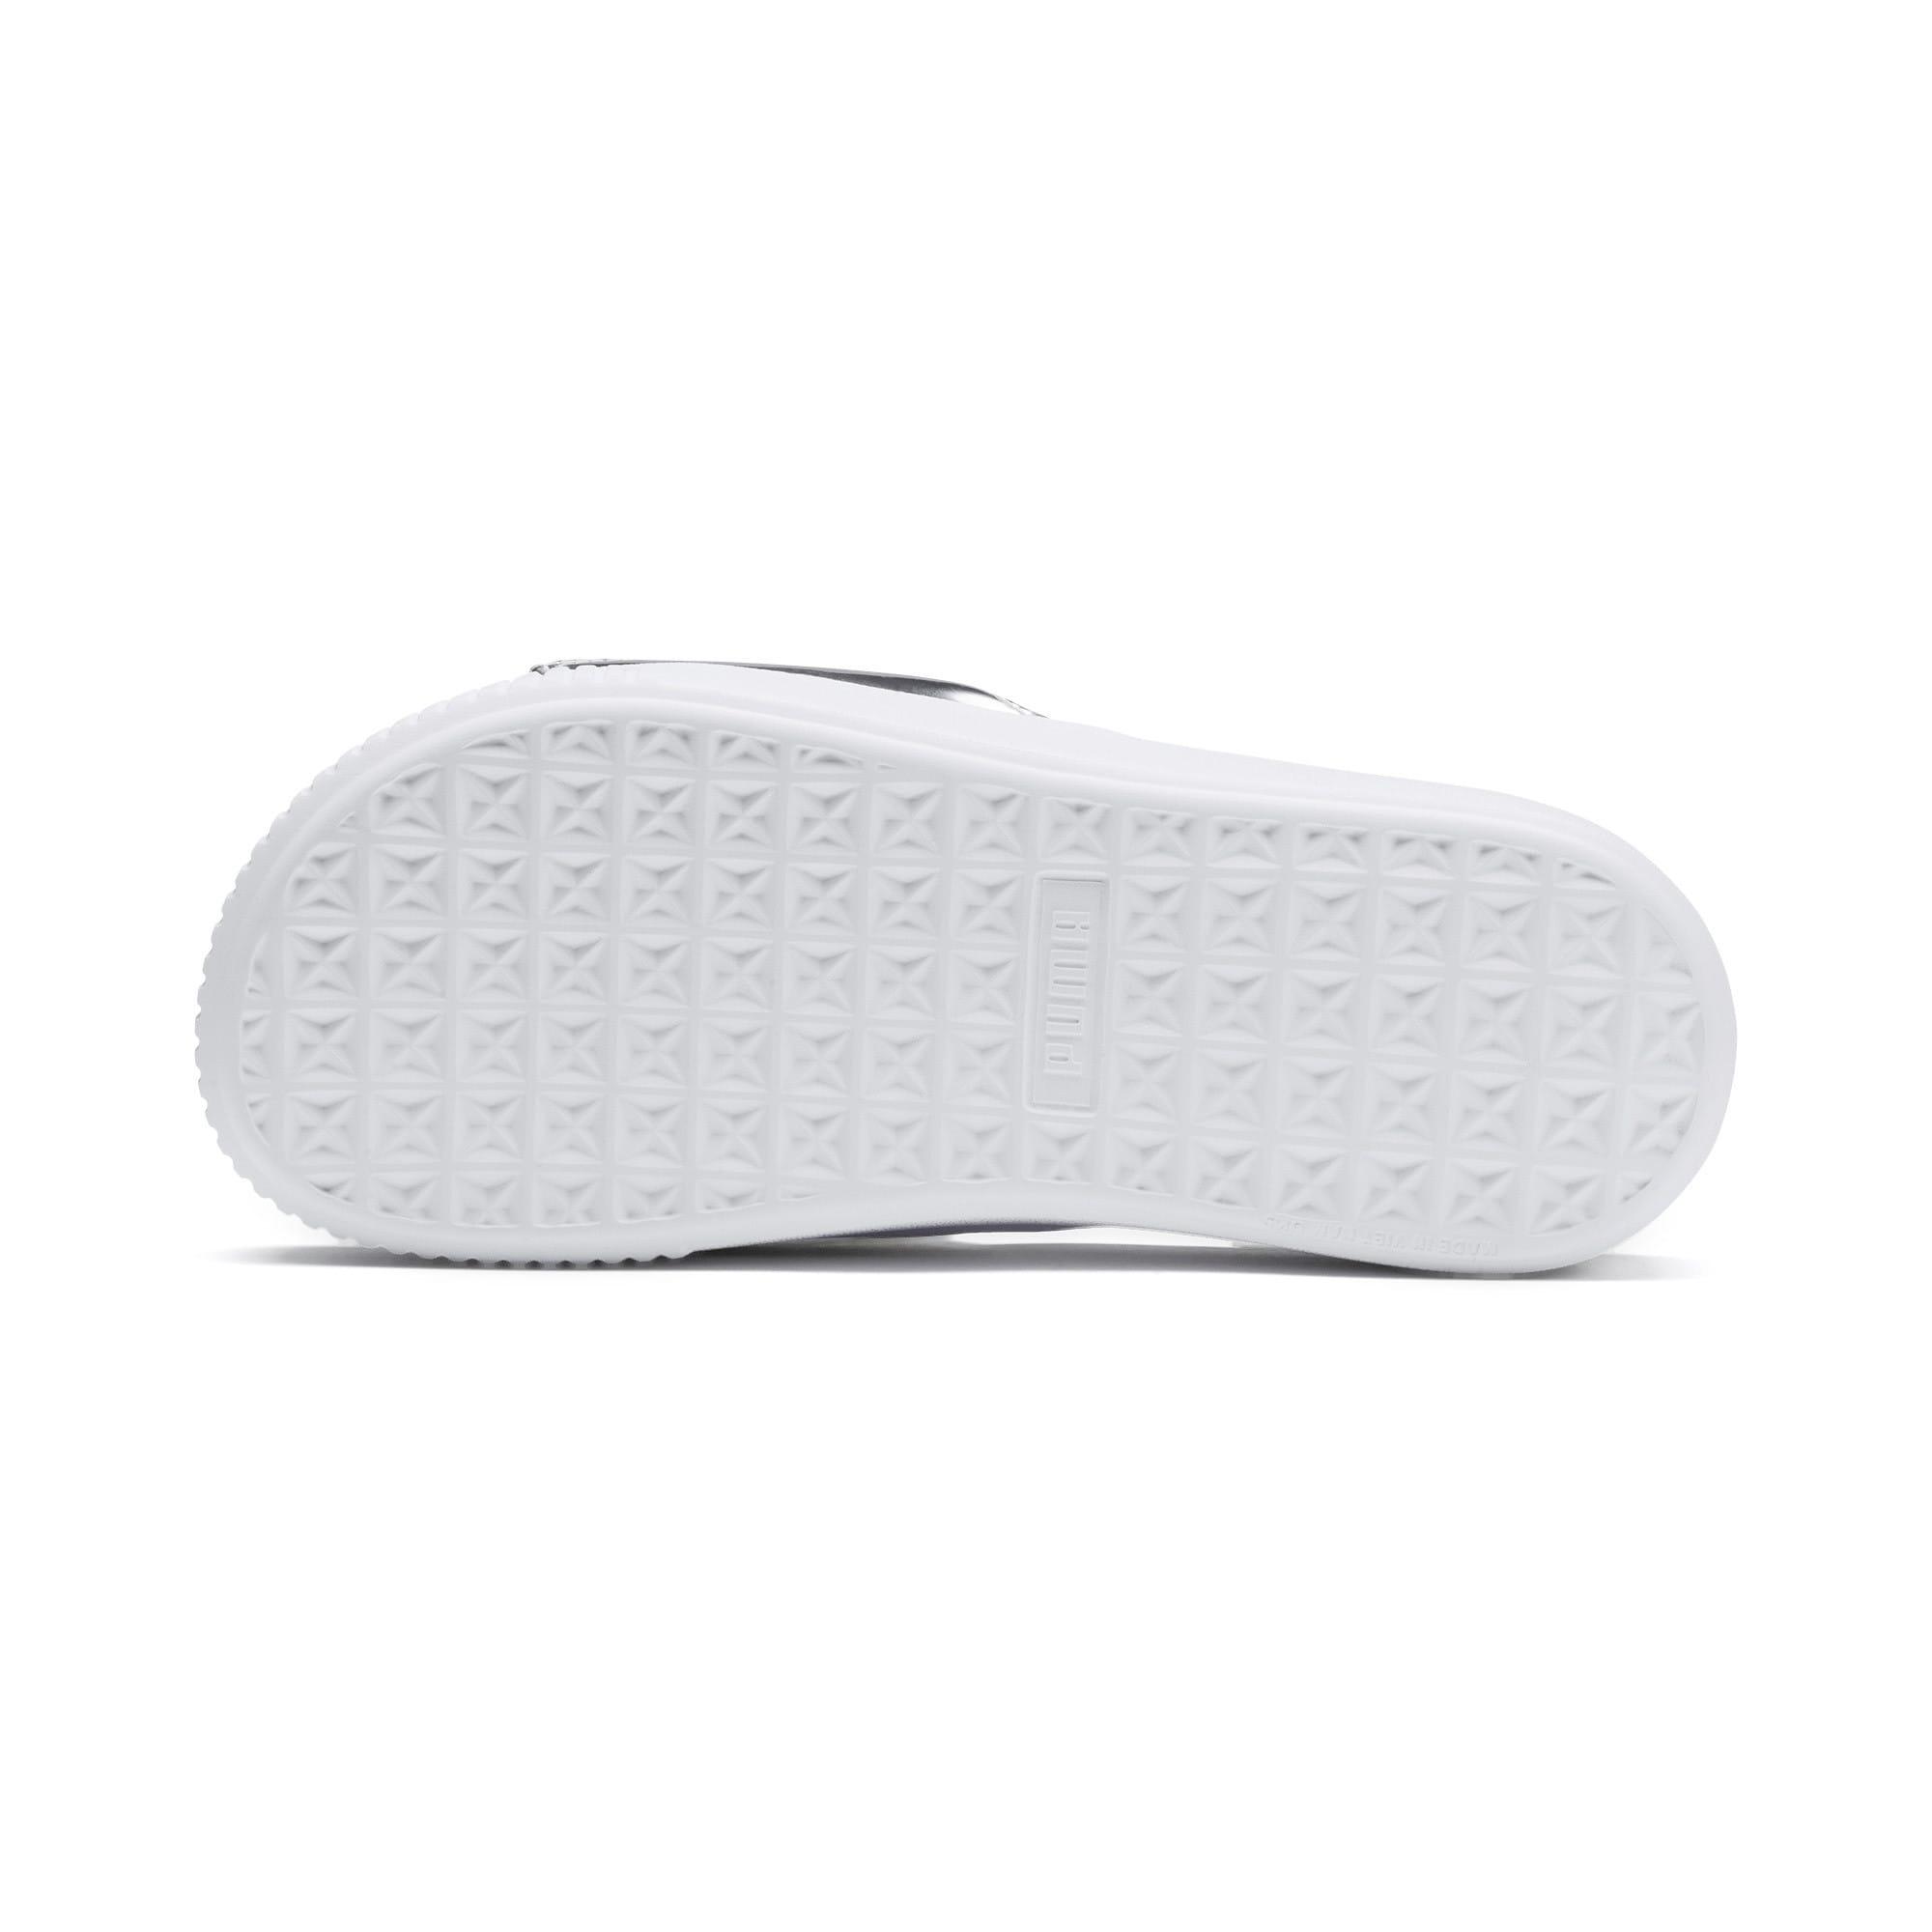 Thumbnail 4 of Platform Slide Trailblazer Metallic Women's Sandals, Puma White-Puma Silver, medium